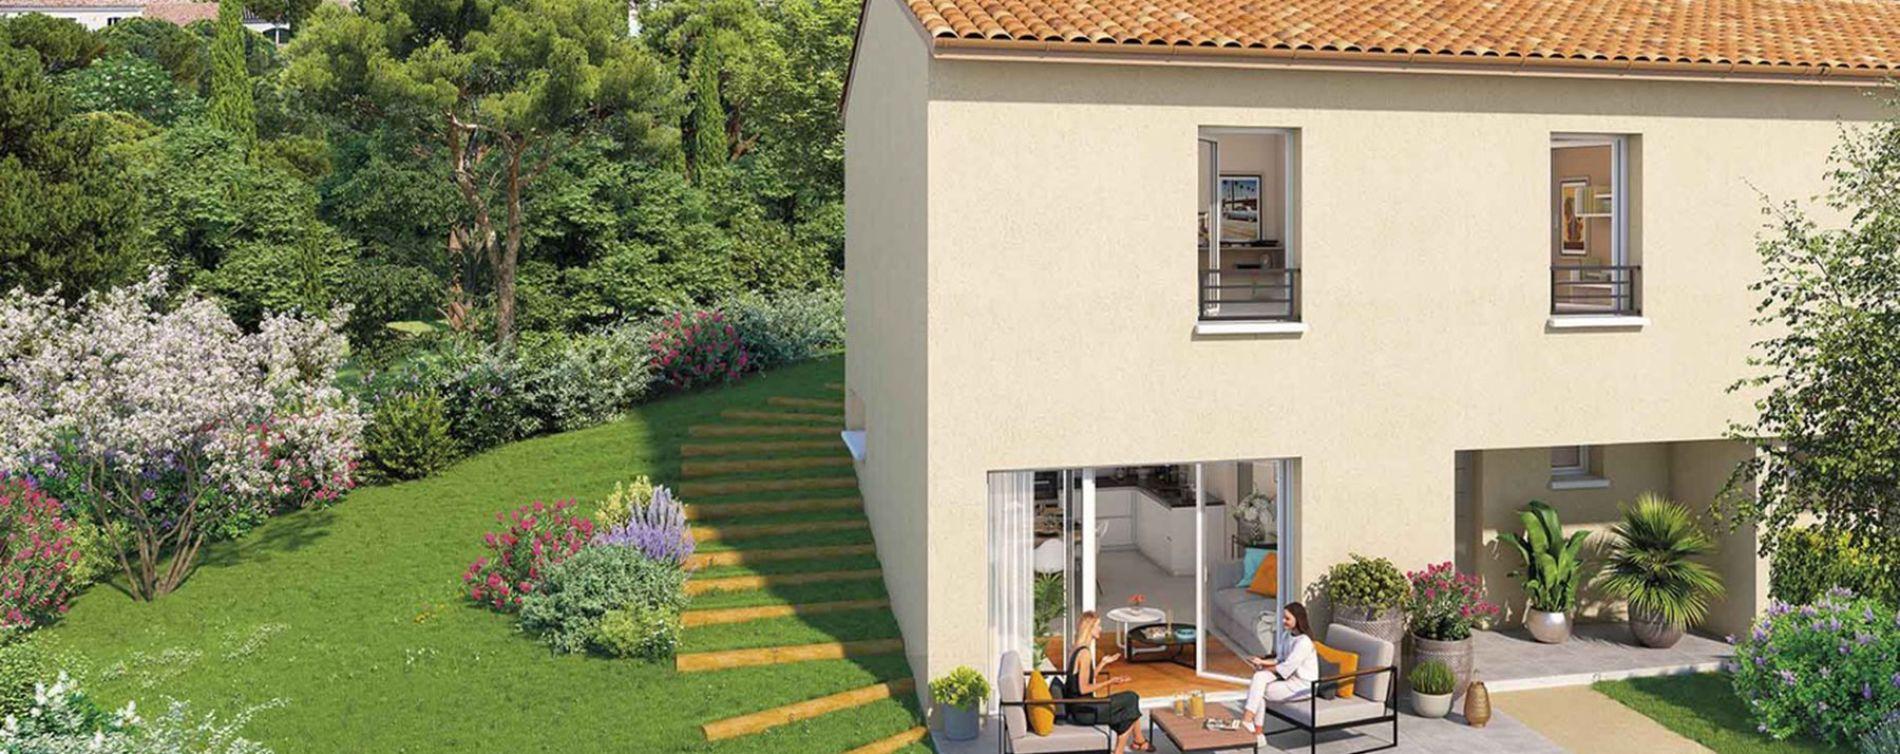 Gardanne : programme immobilier neuve « Harmonie Provence » (2)